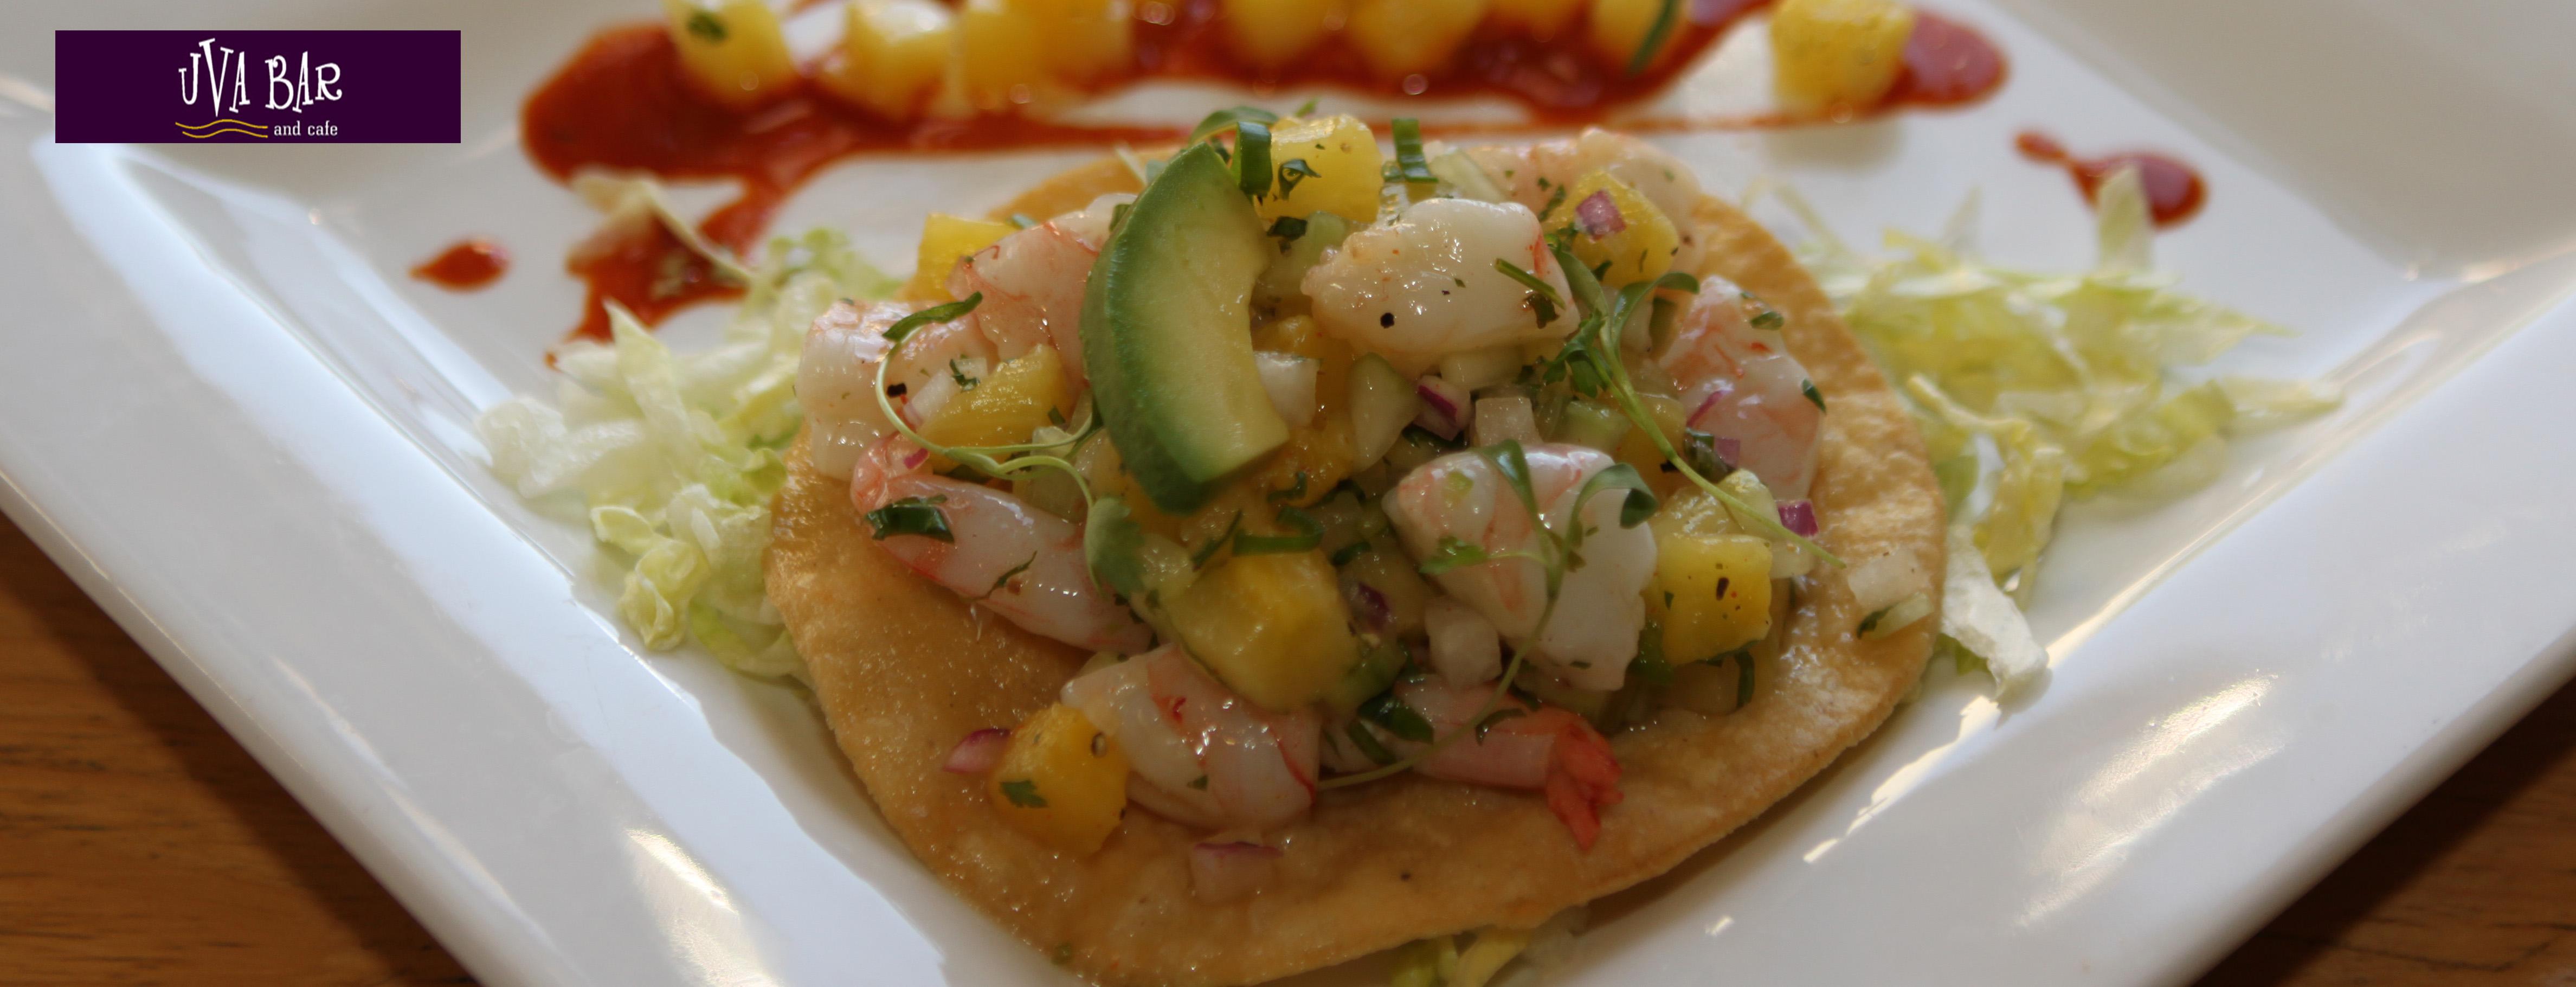 Photo of Pineapple Shrimp Ceviche Tostada